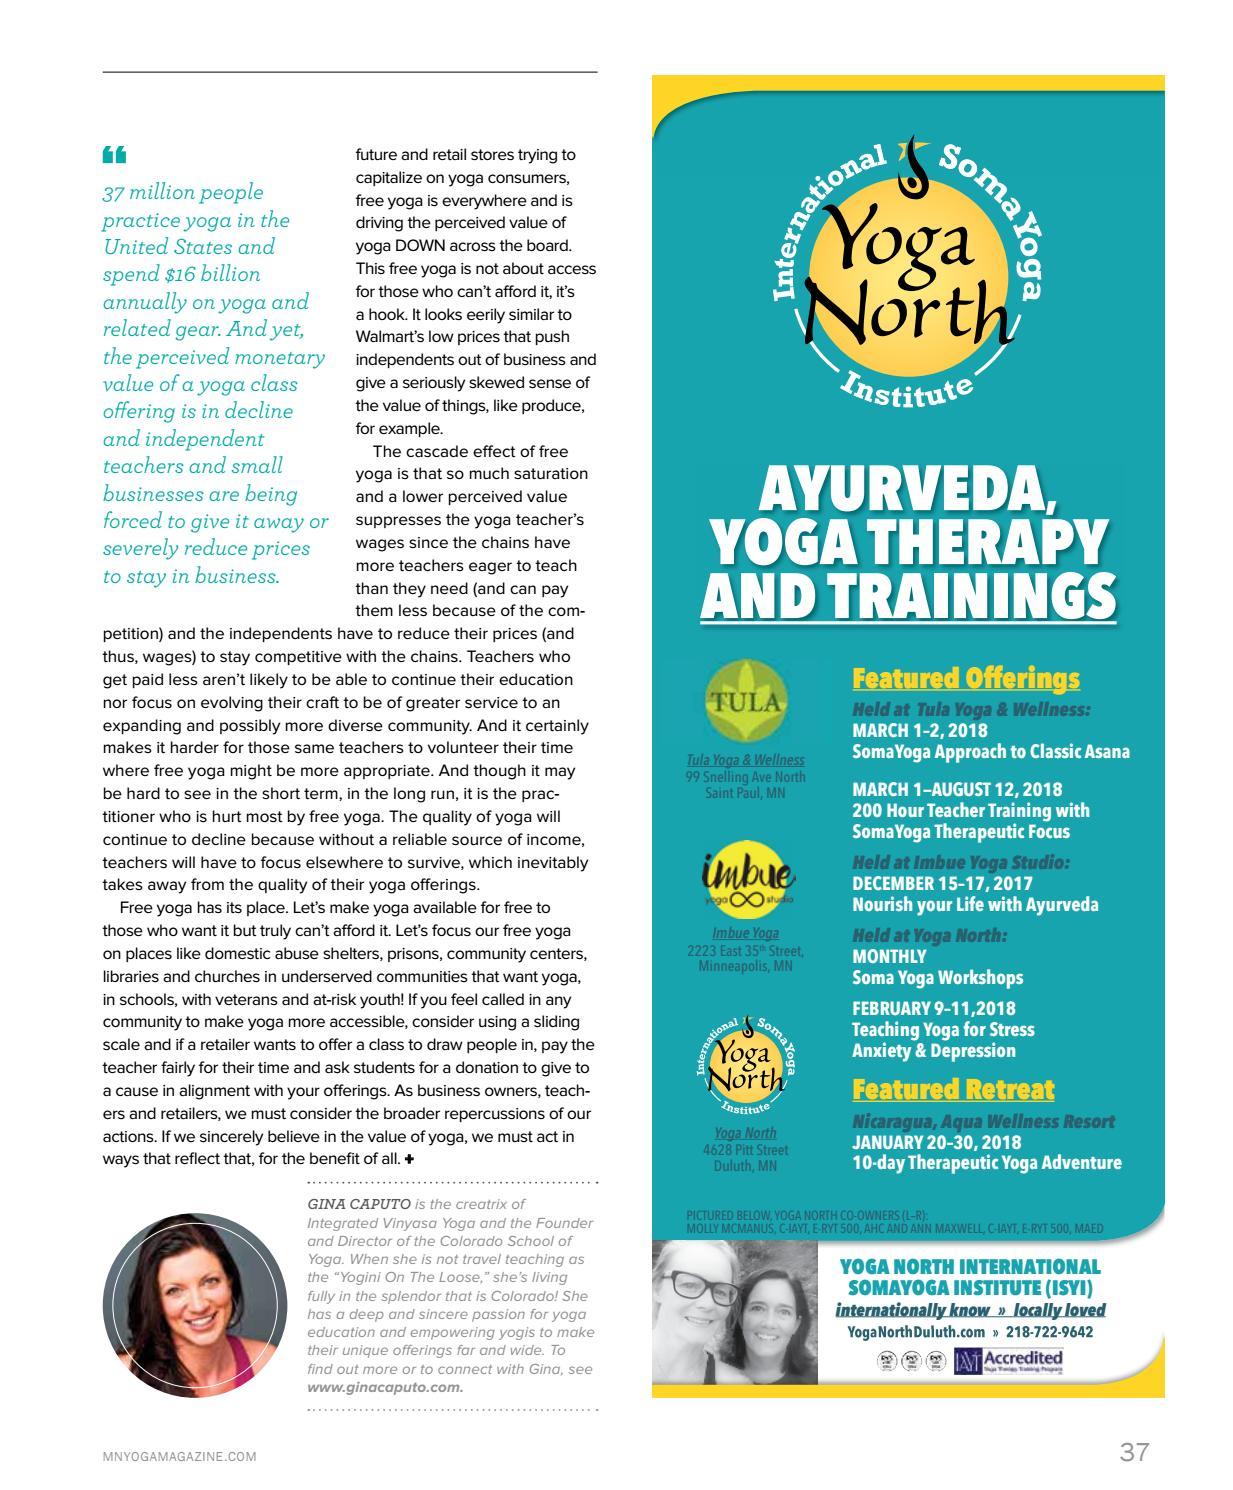 Mn Yoga Life Winter Spring 2017 18 By Yoga Life Magazines Issuu